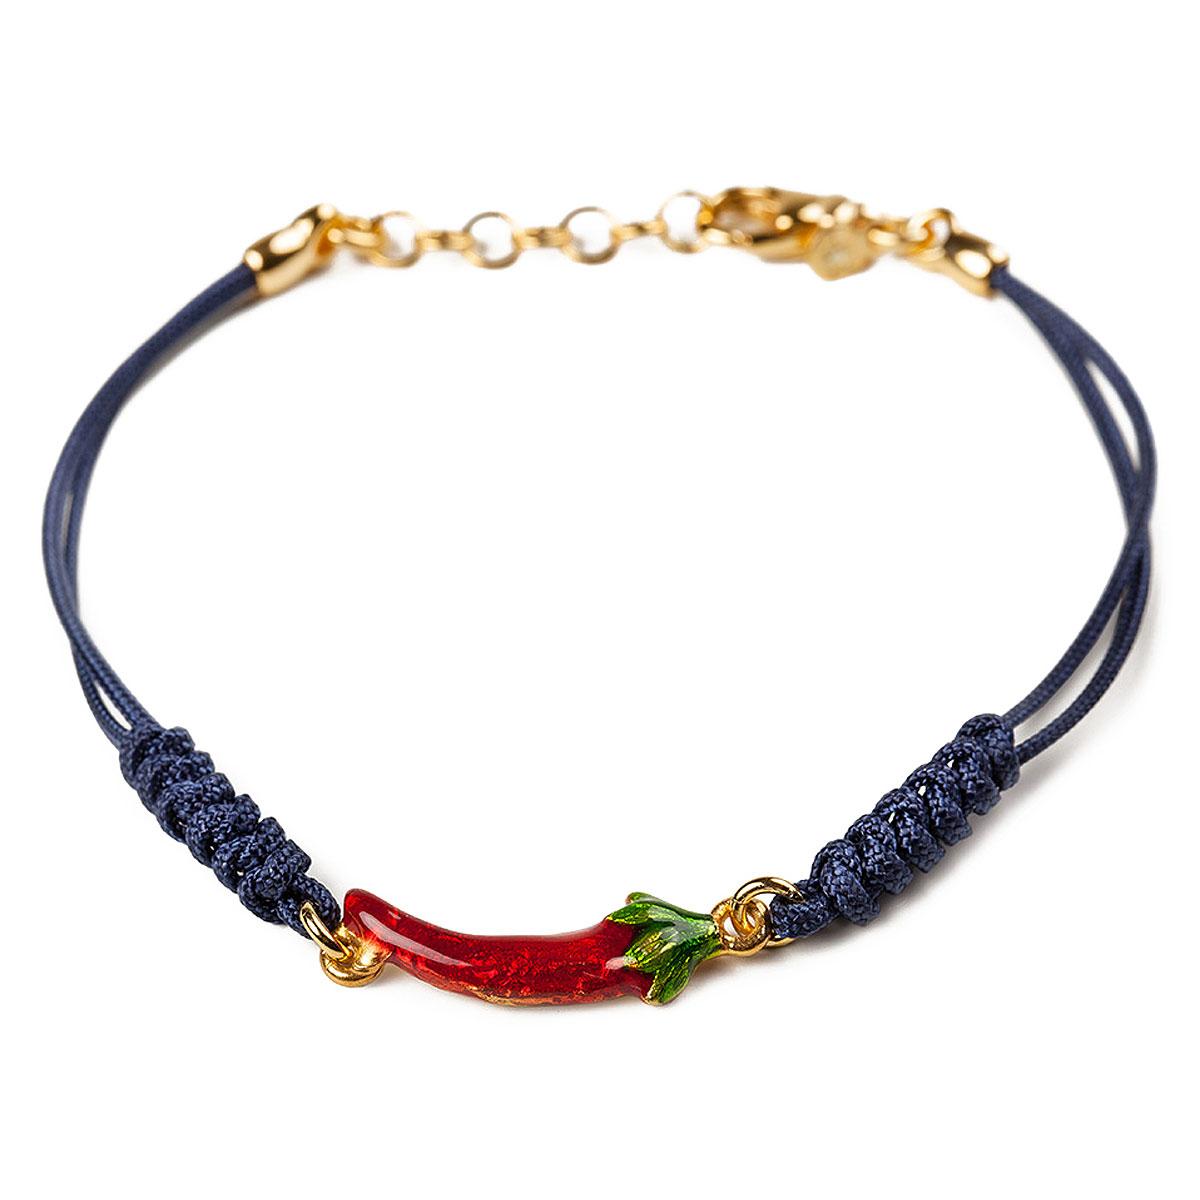 Image of Isola Bella Bracelet for Women, Navy Blue, Silver 925 Galvanized Gold, 2017